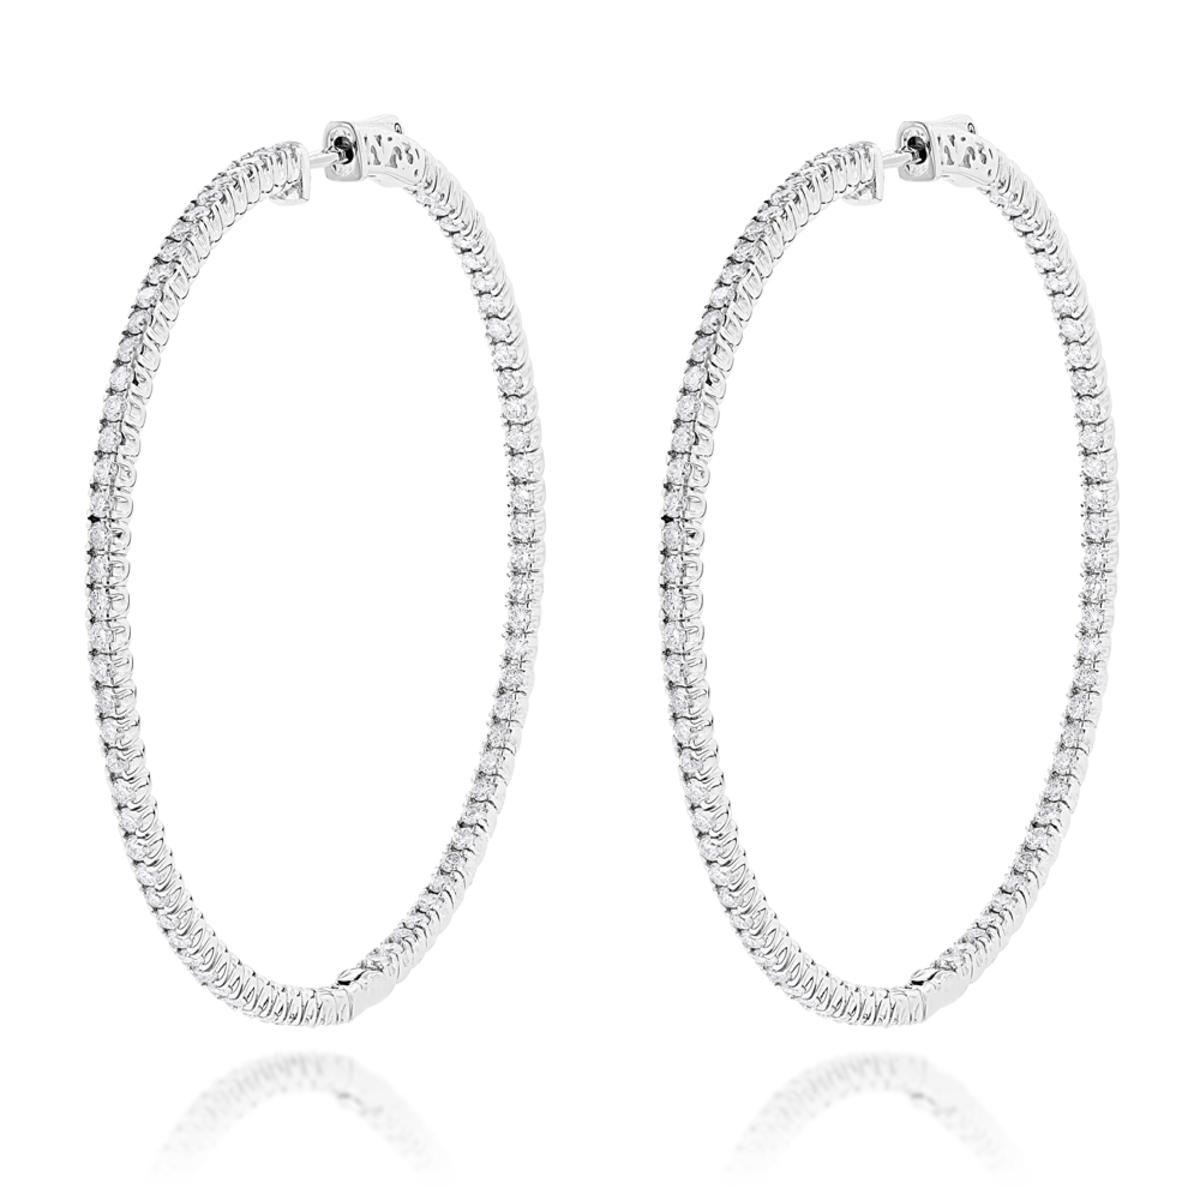 2 Inch Diamond Hoop Earrings 4ct 14K Gold Inside Out Design